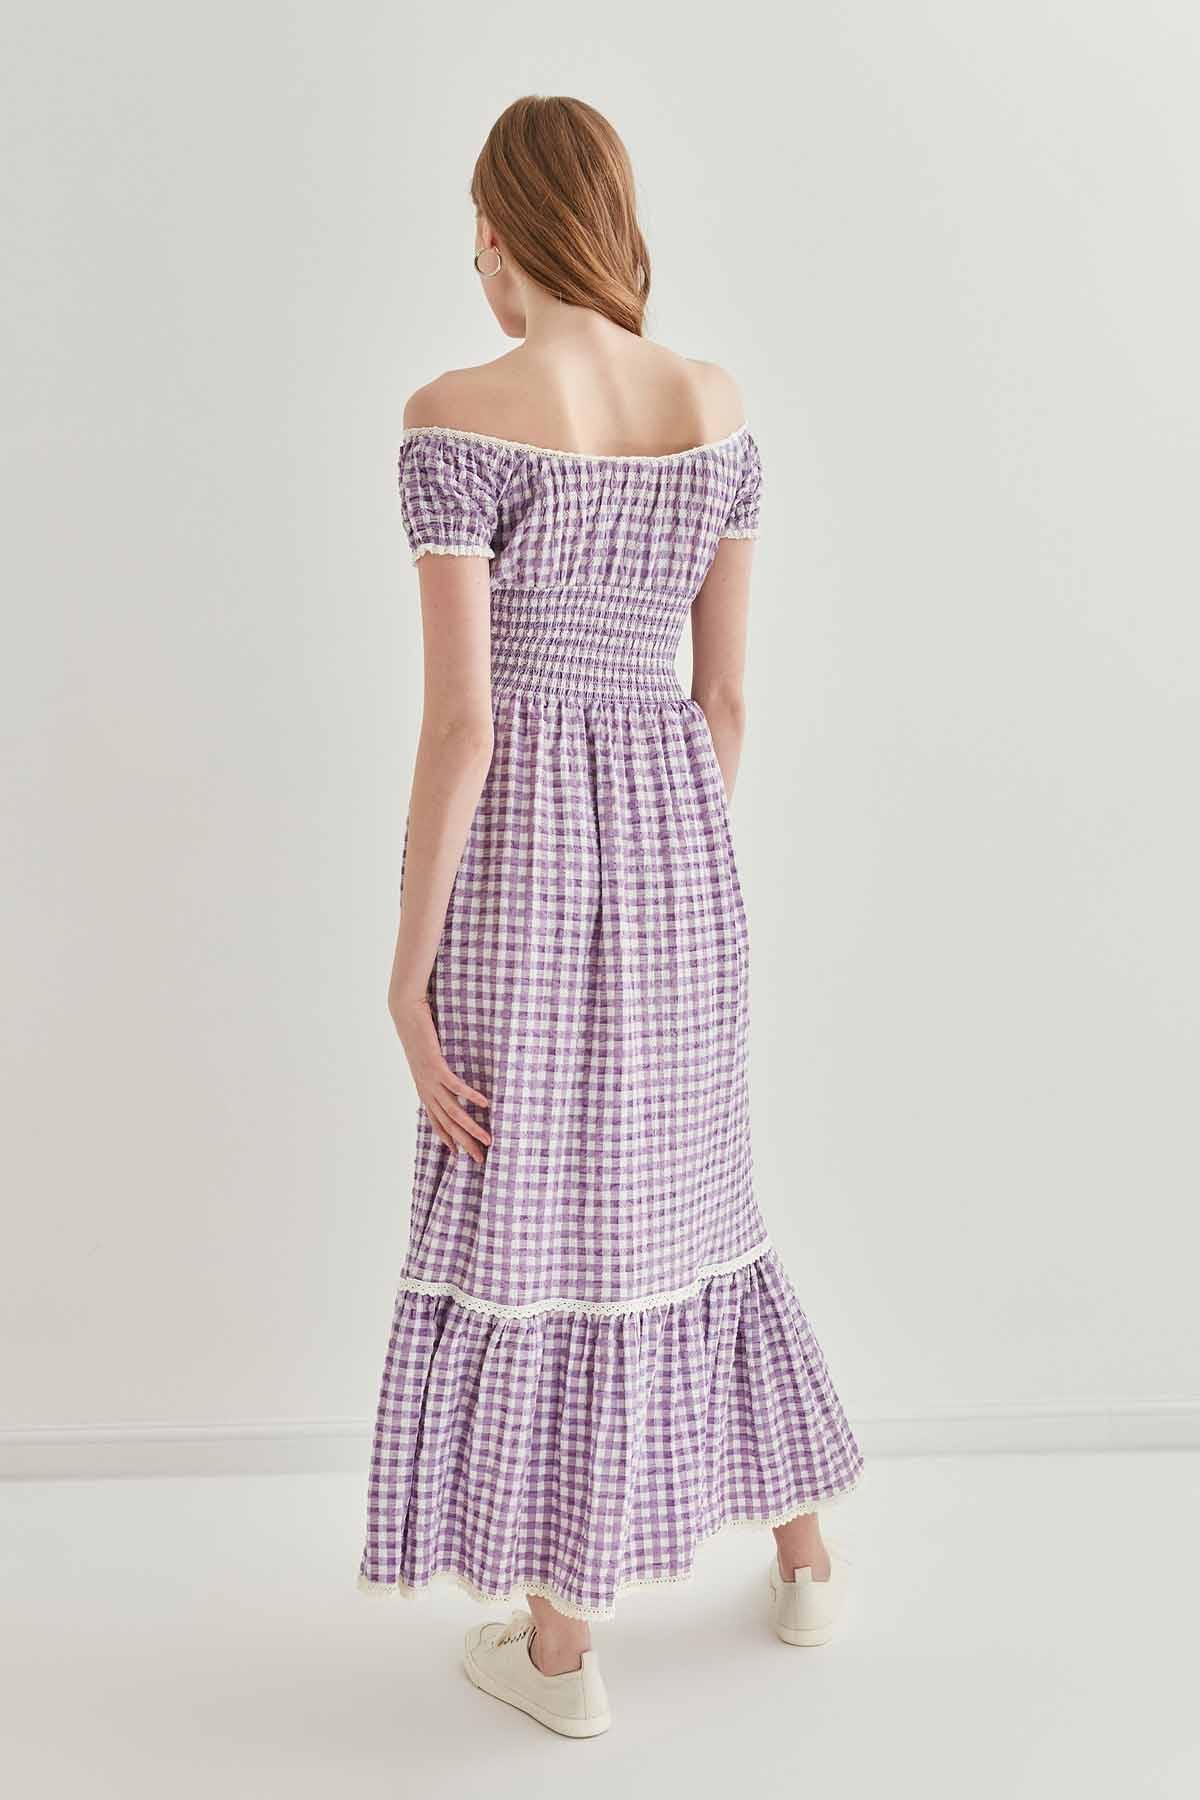 Güpür Şerit Detaylı Uzun Country Elbise - Thumbnail